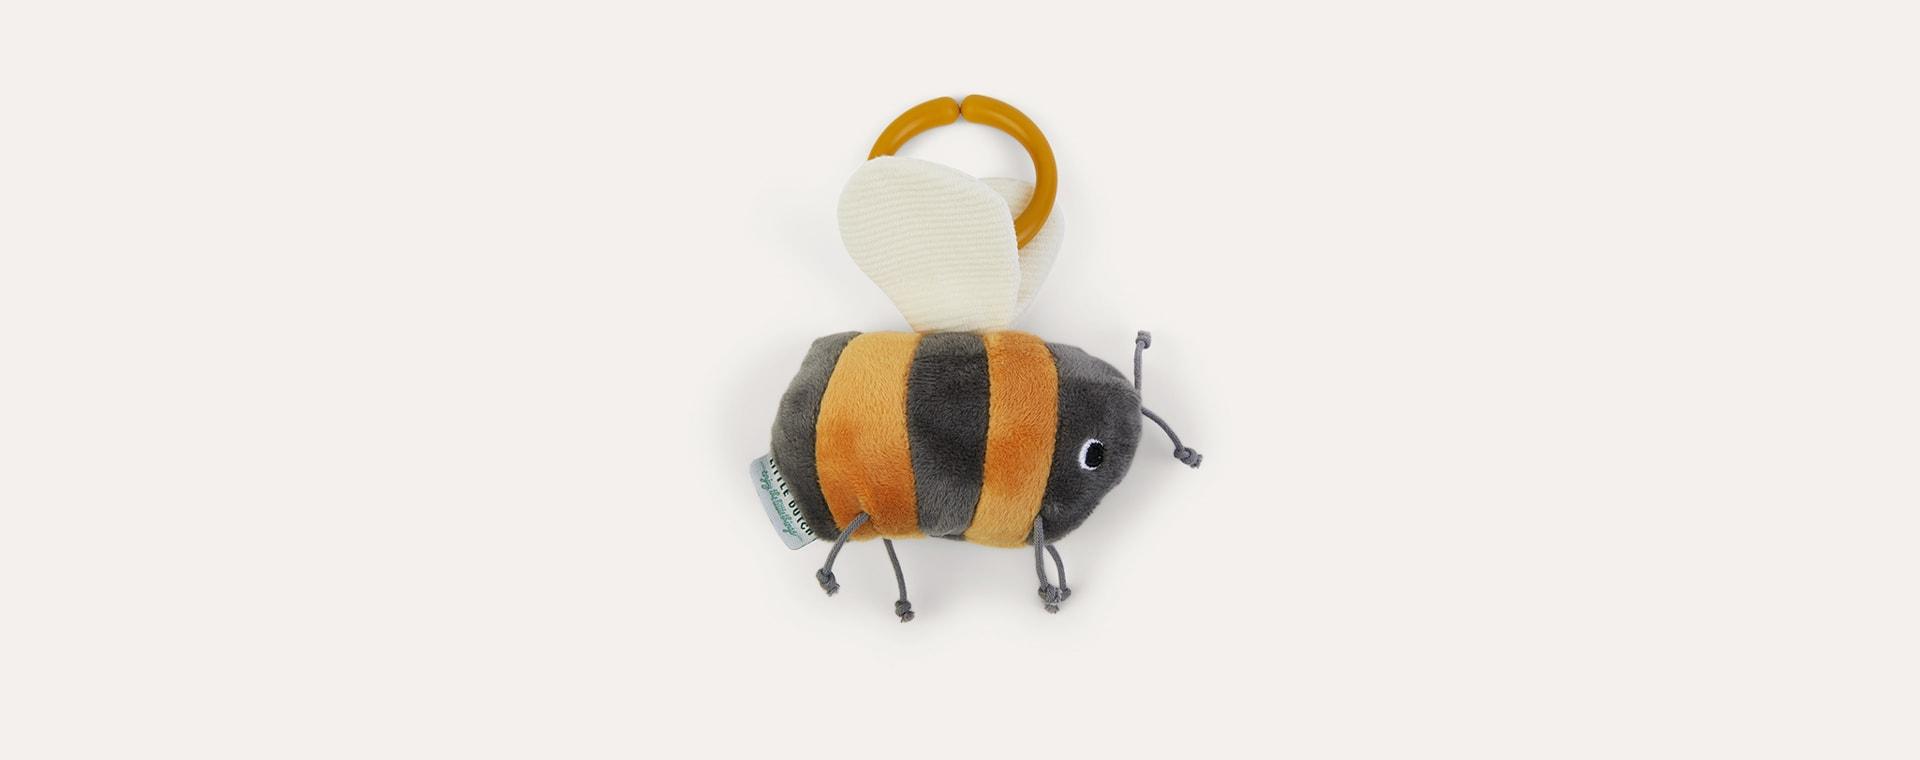 Bumblebee Little Dutch Pull and Shake Bumblebee